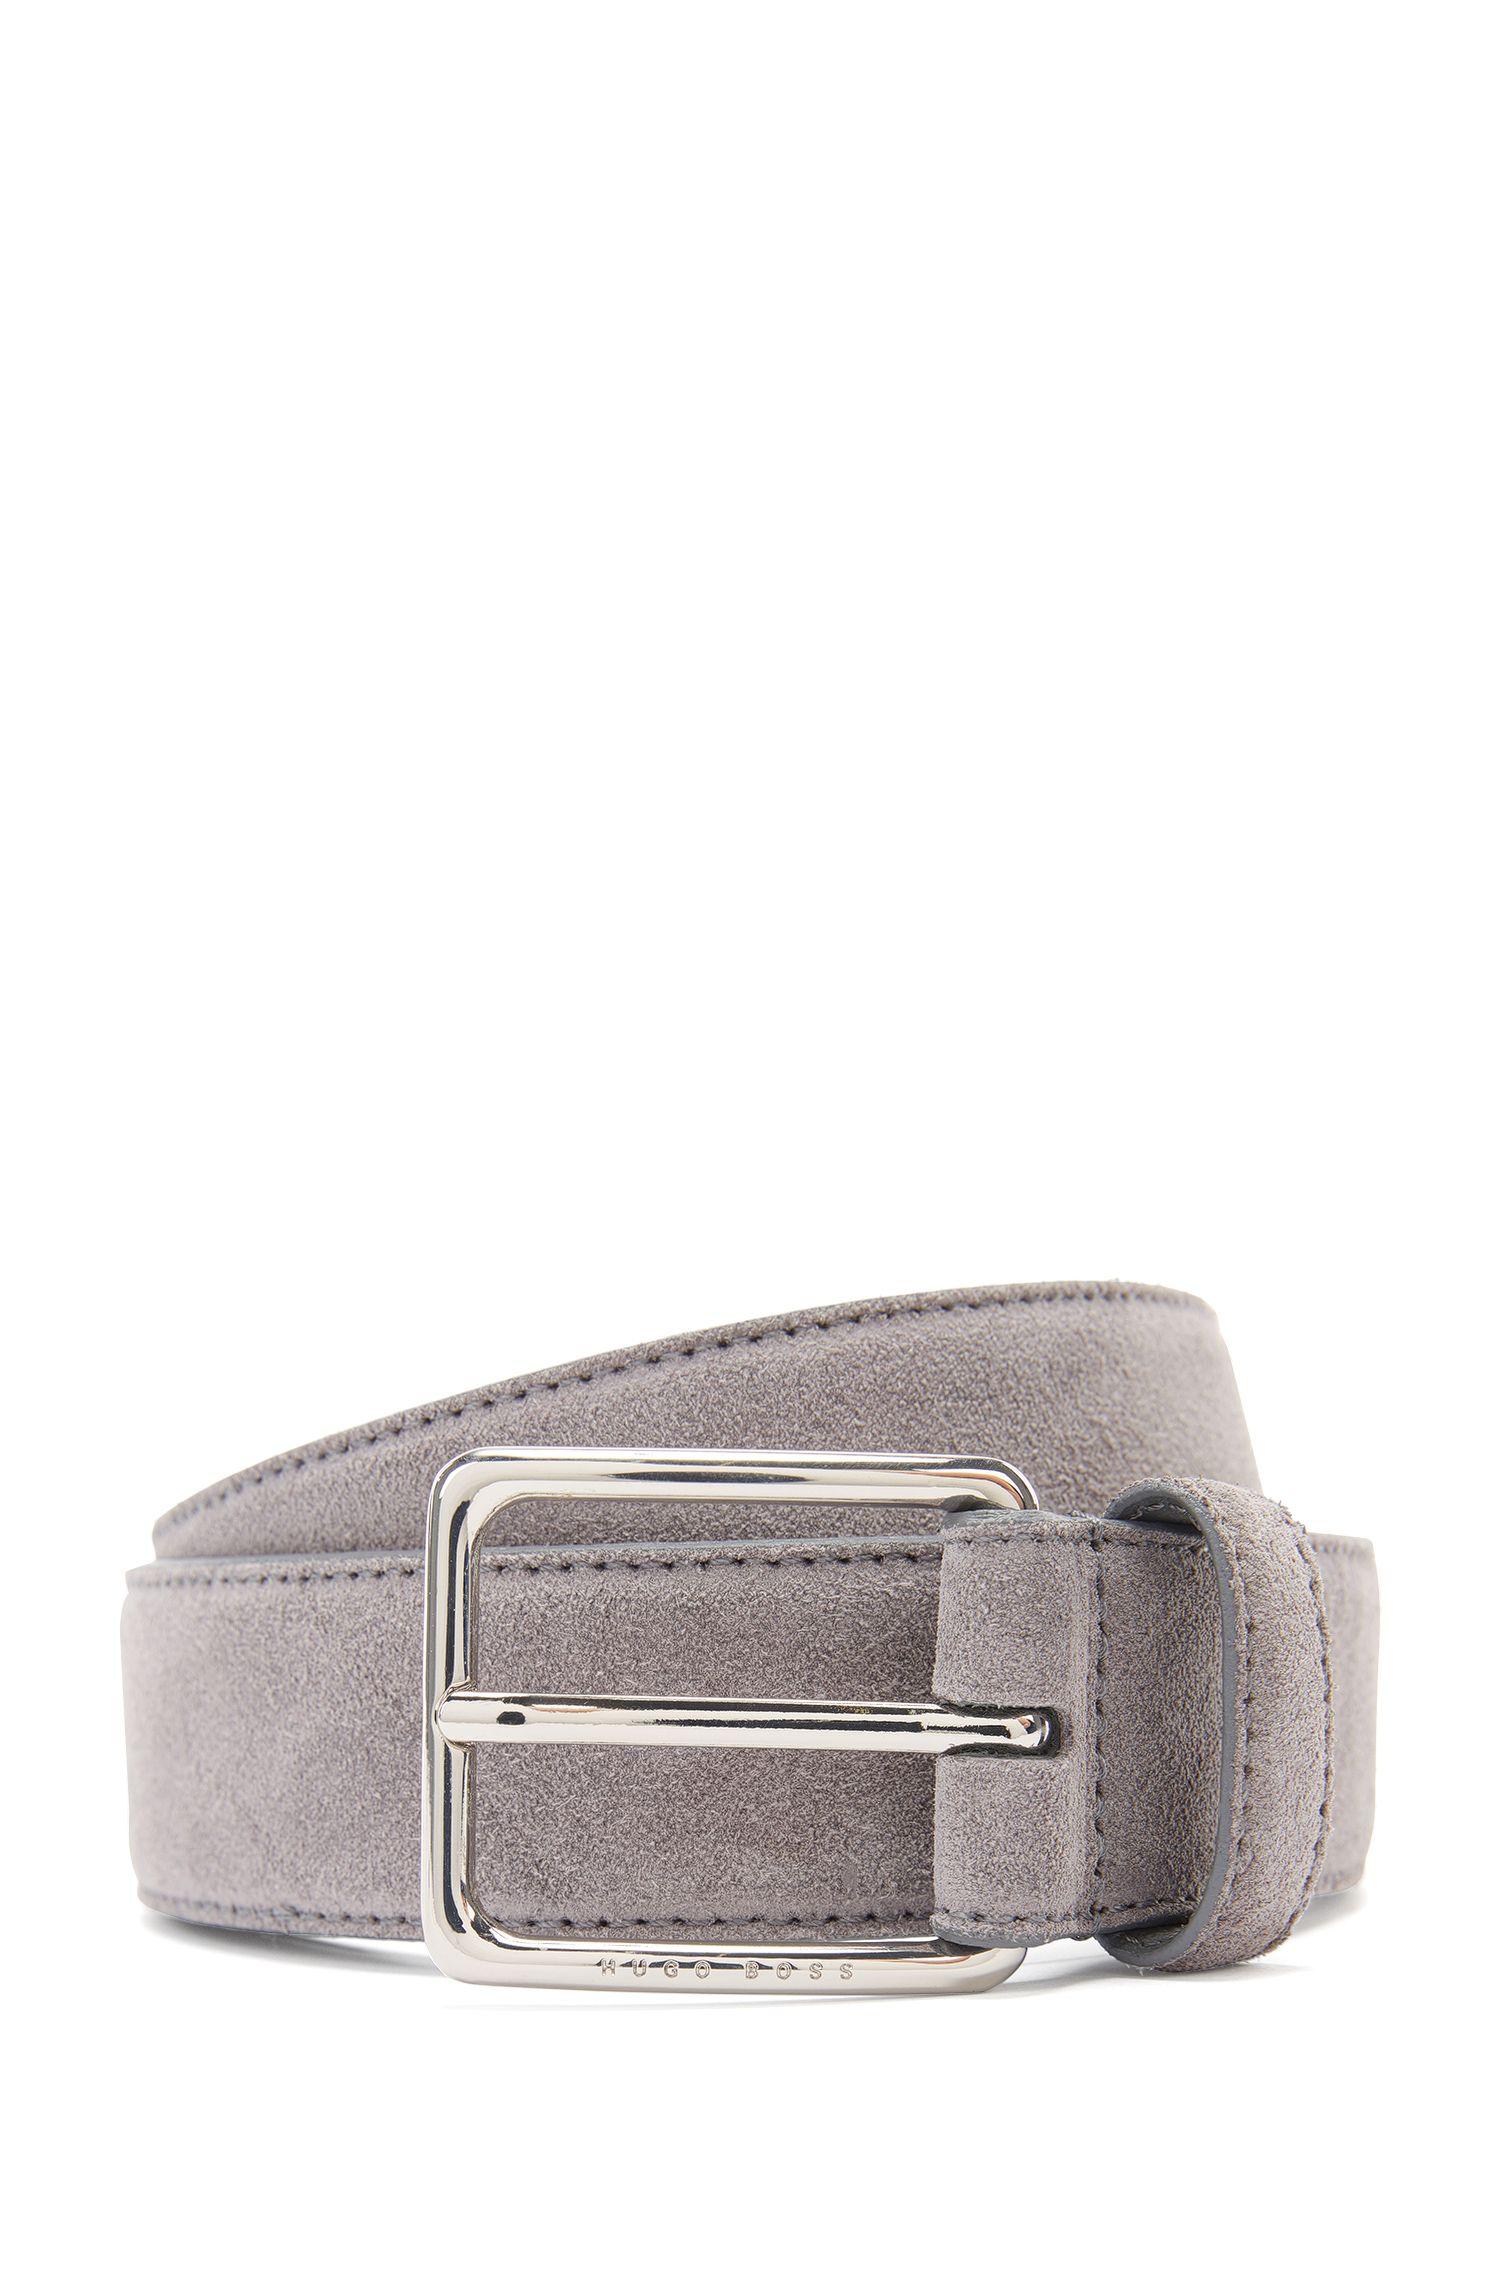 Suede Leather Belt   Catioso Sz Sdpl